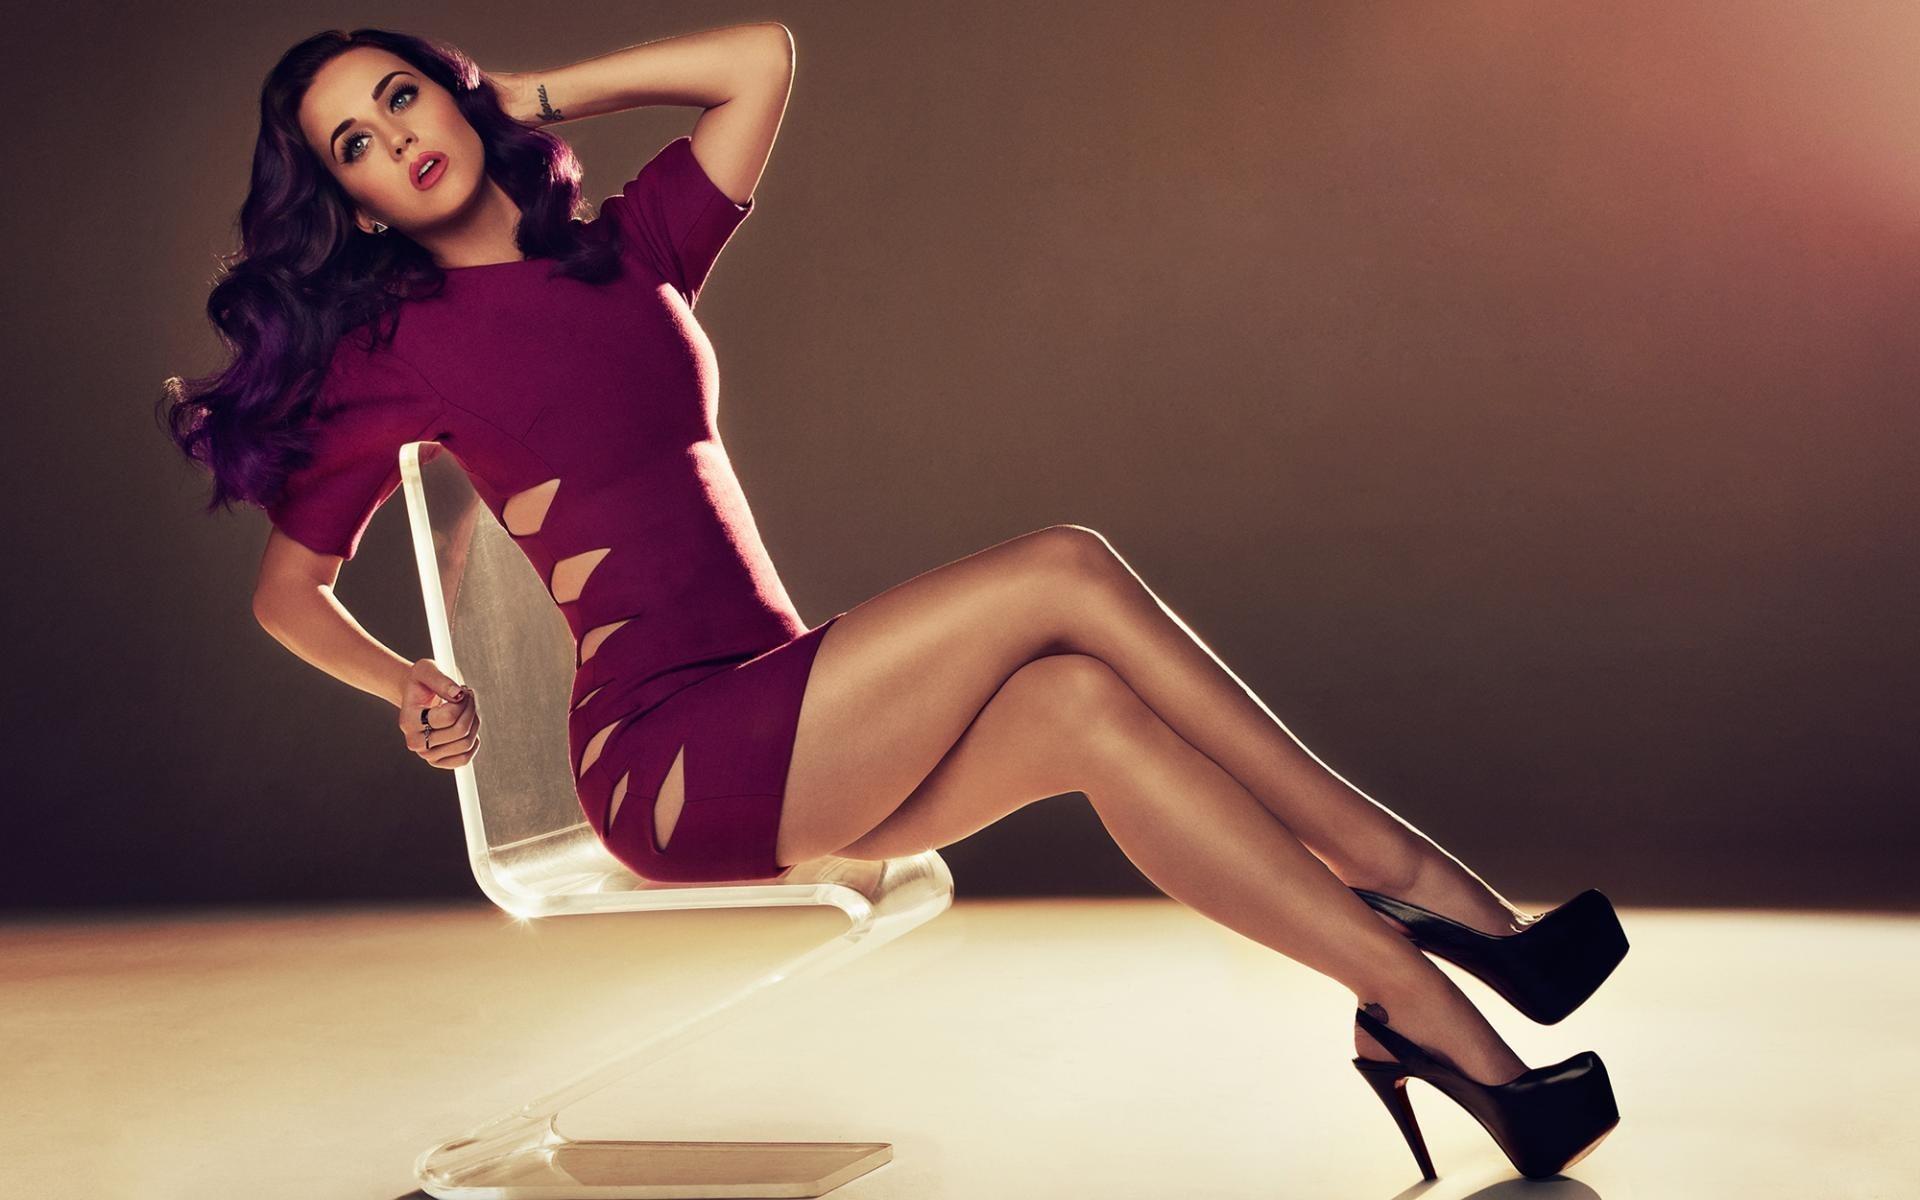 Katy Perry Singer Girl